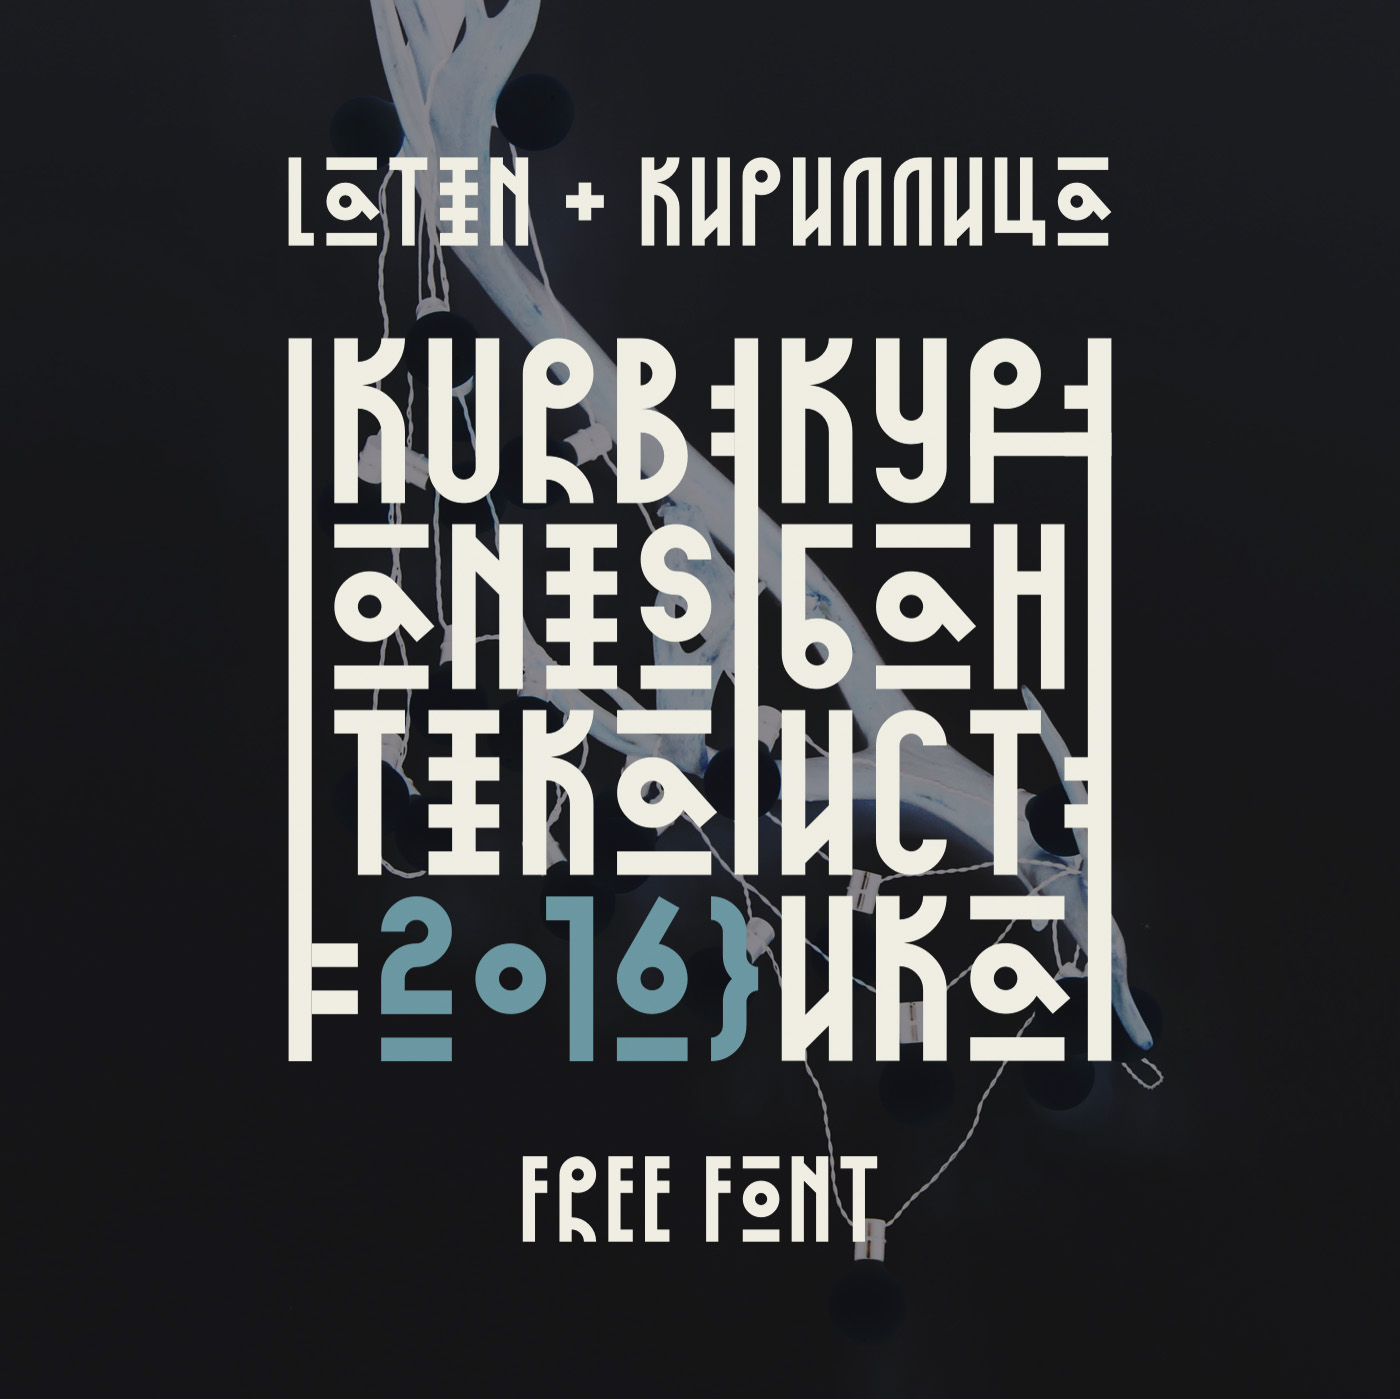 Kurbanistika – Free Display Font Poster A